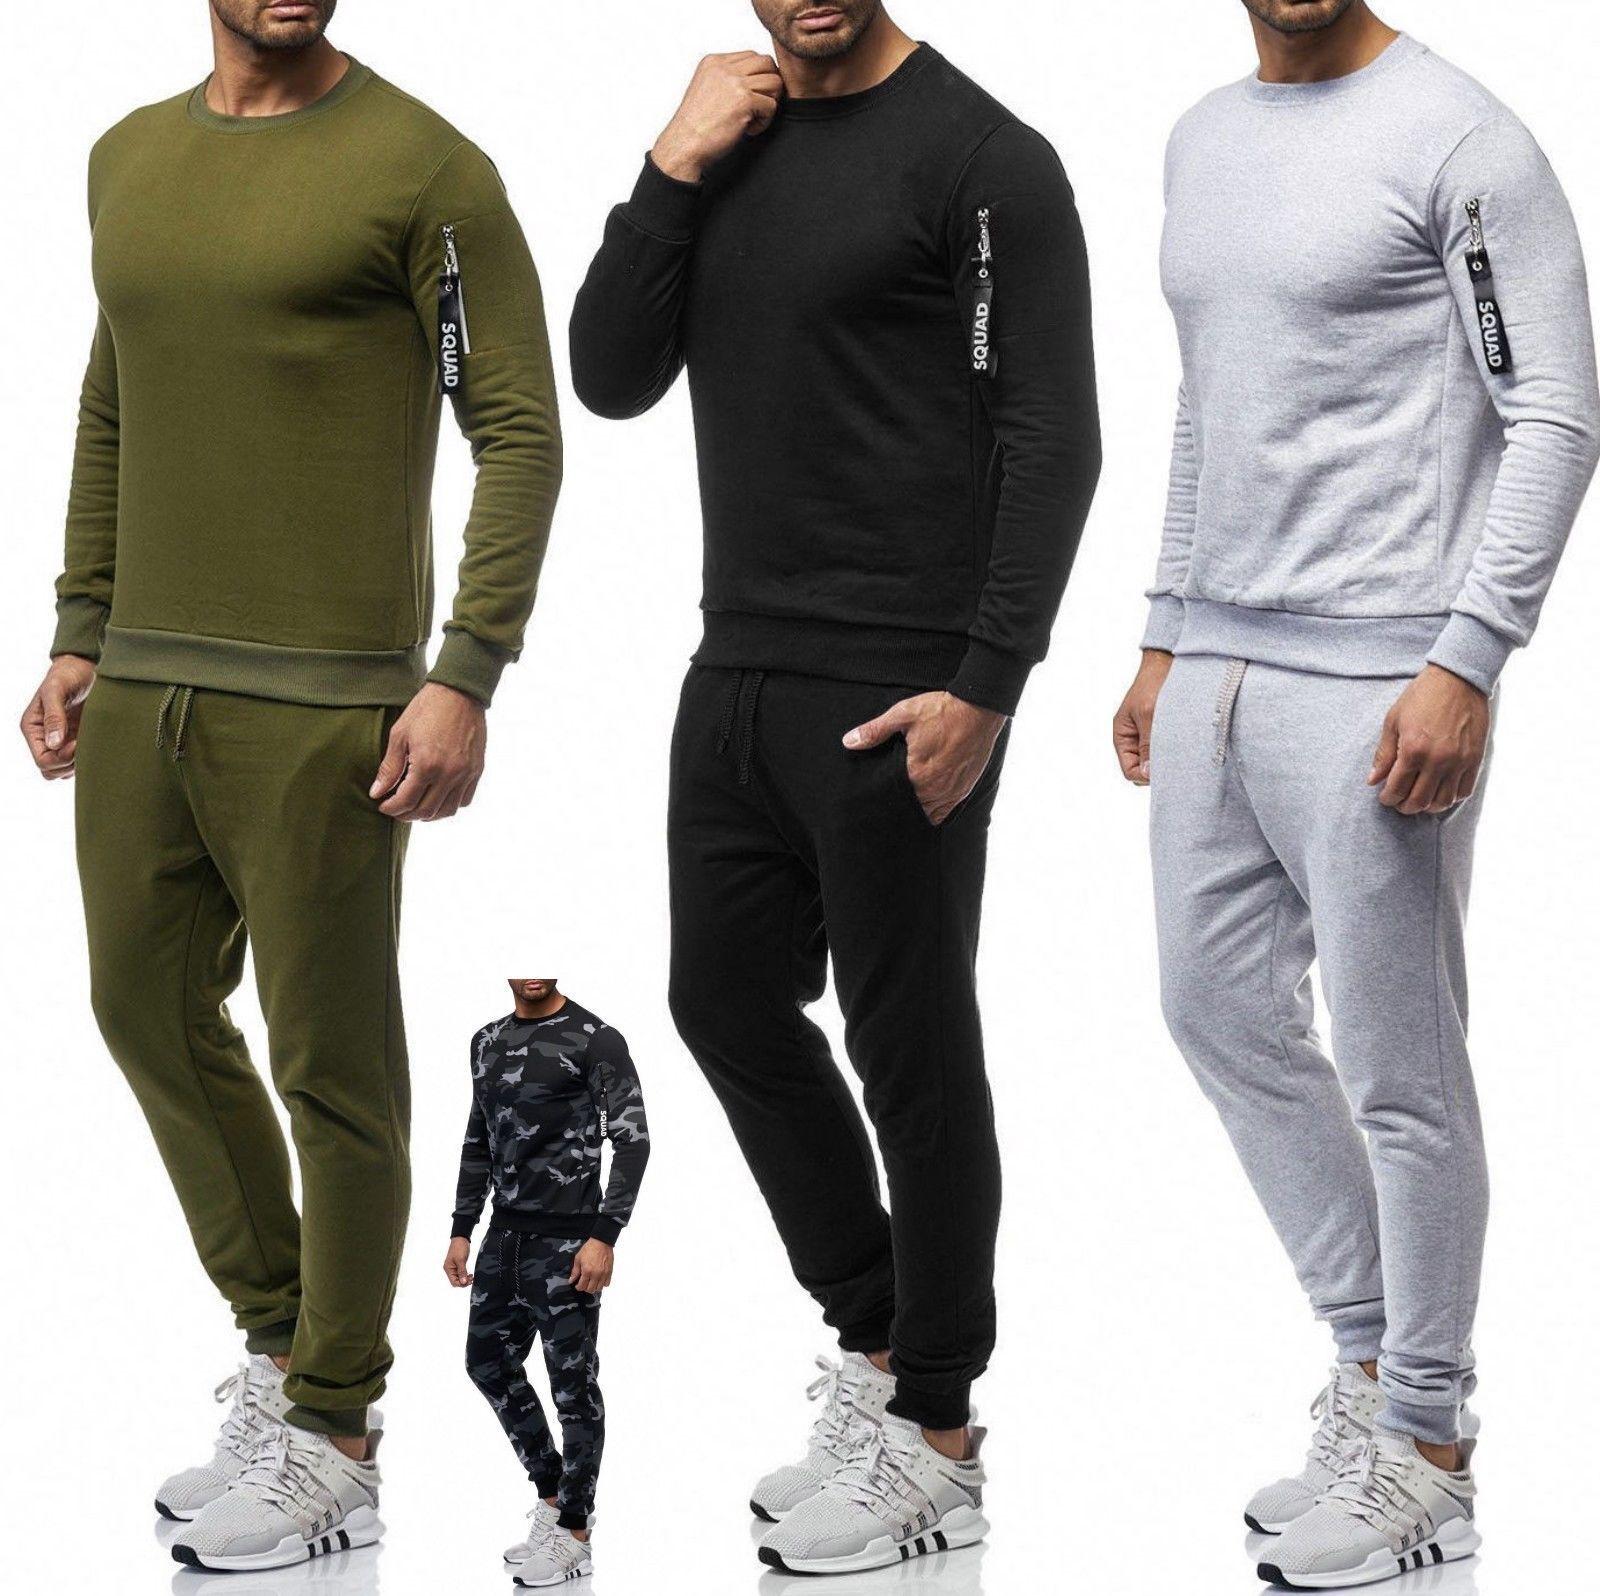 Herren Sportanzug Basic Squad Anzug Jogginganzug Jacke Hose Camo 0962